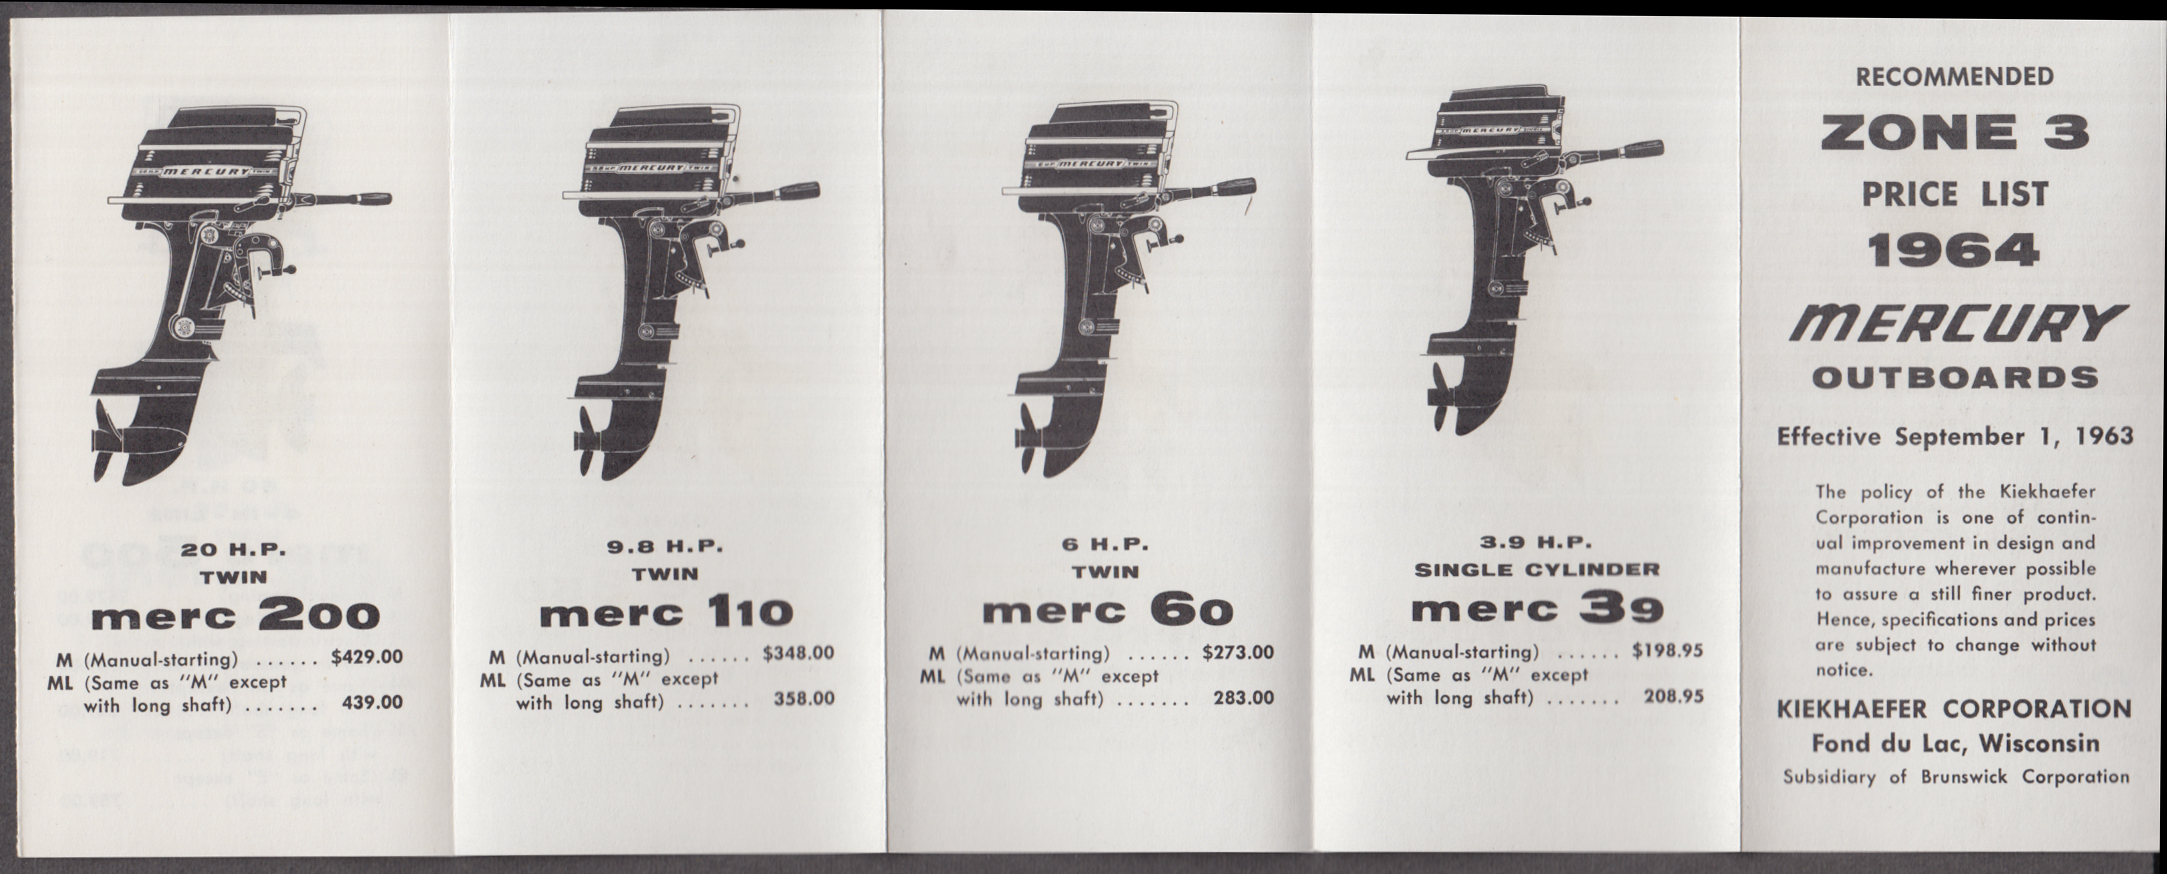 Kiekhaefer Mercury Outboard Motor Silver Anniversary Fleet price list 1964